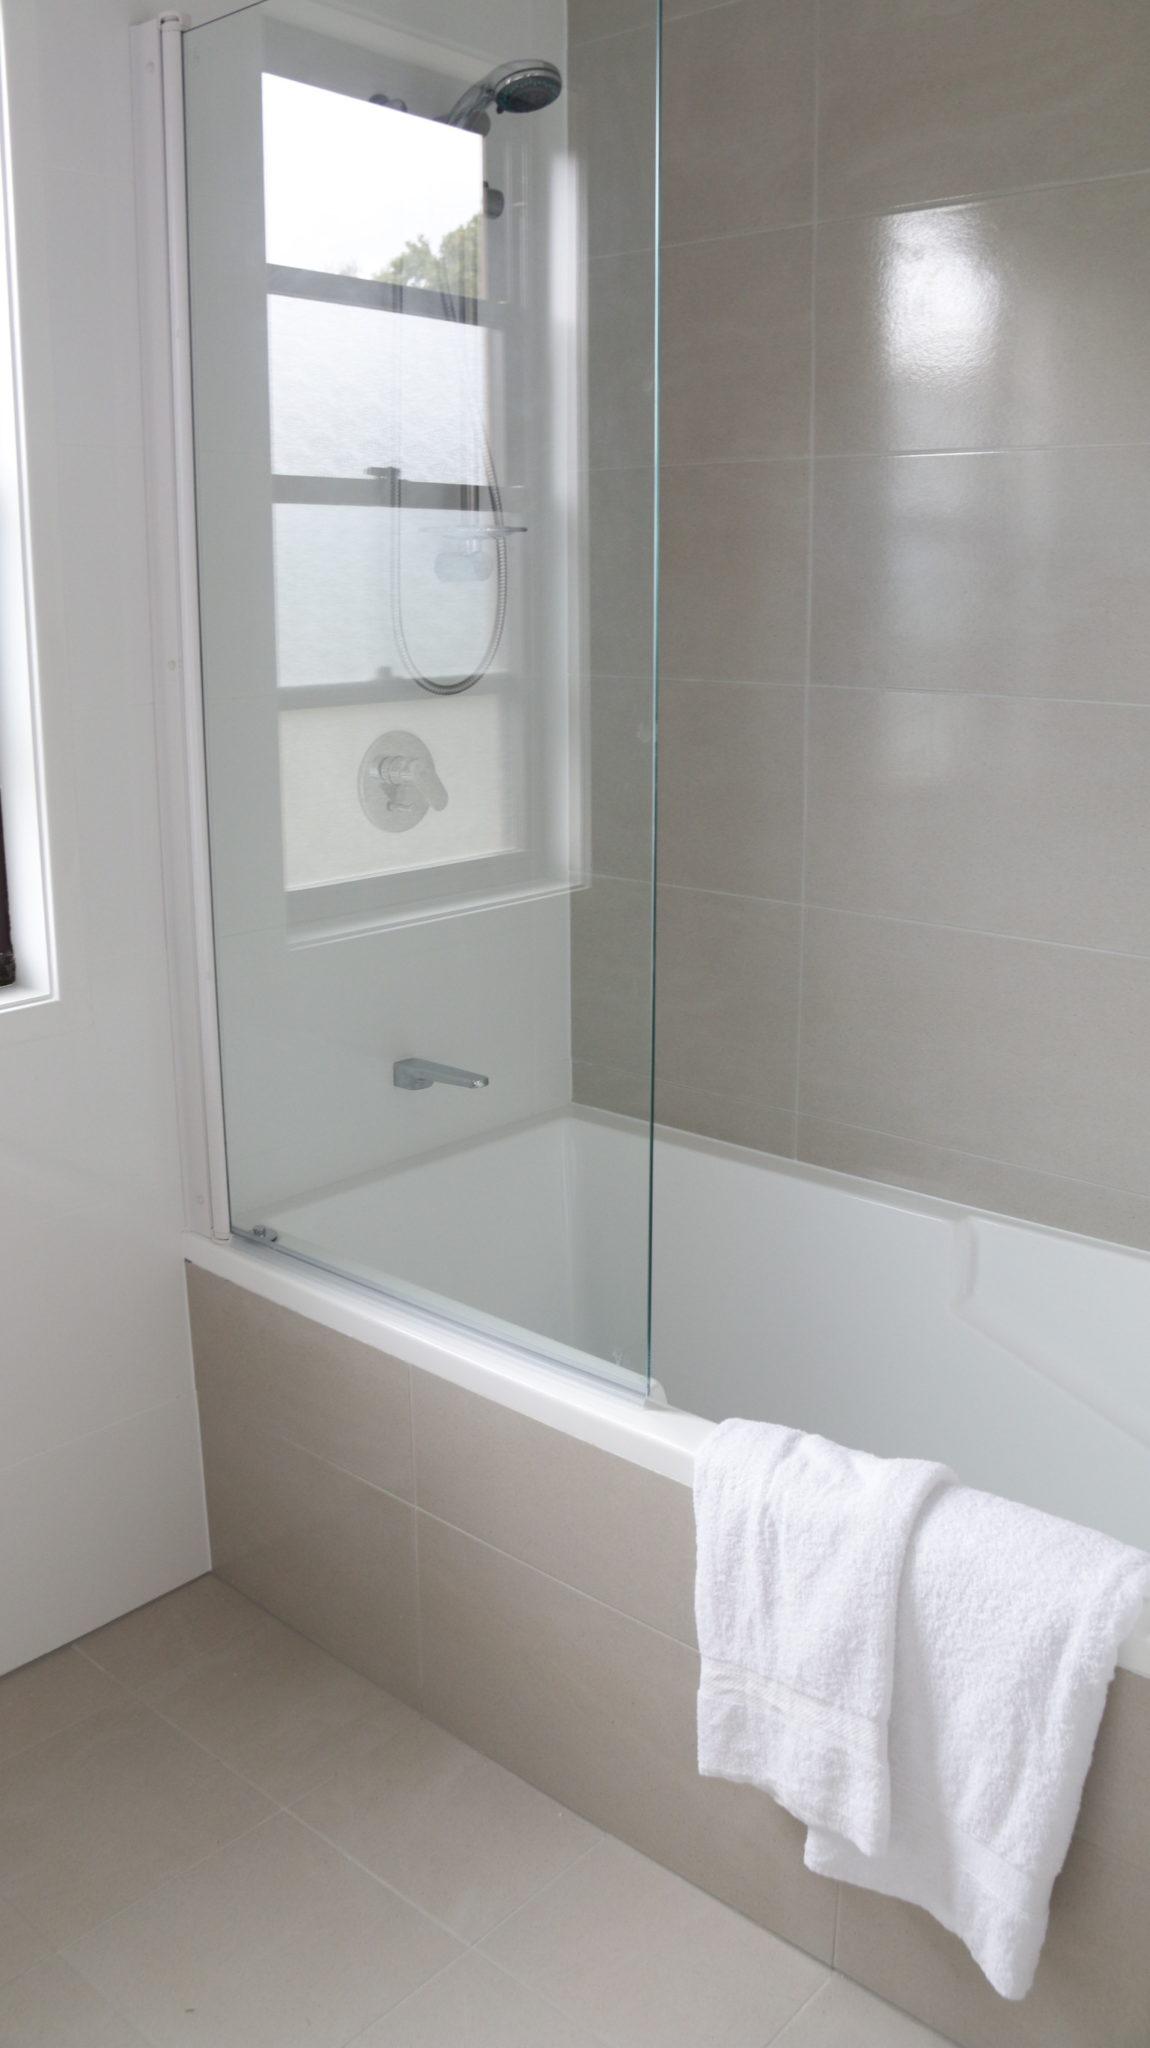 The Rapid Renovation Challenge - Bathroom and master bedroom revealed